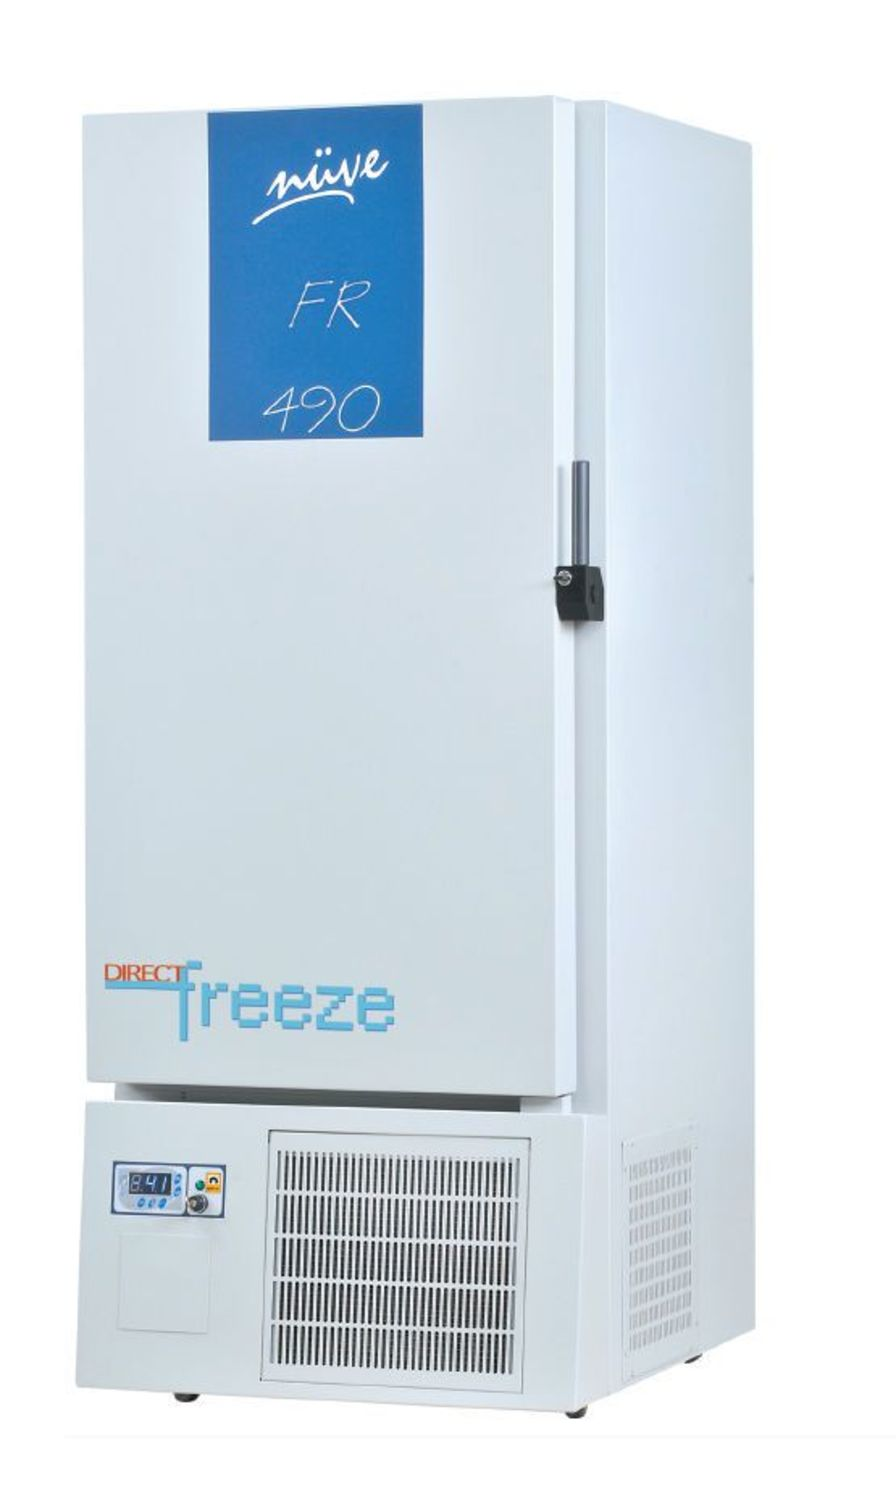 Laboratory freezer / cabinet / 1-door -41 °C, 455 L | FR 490 Nüve